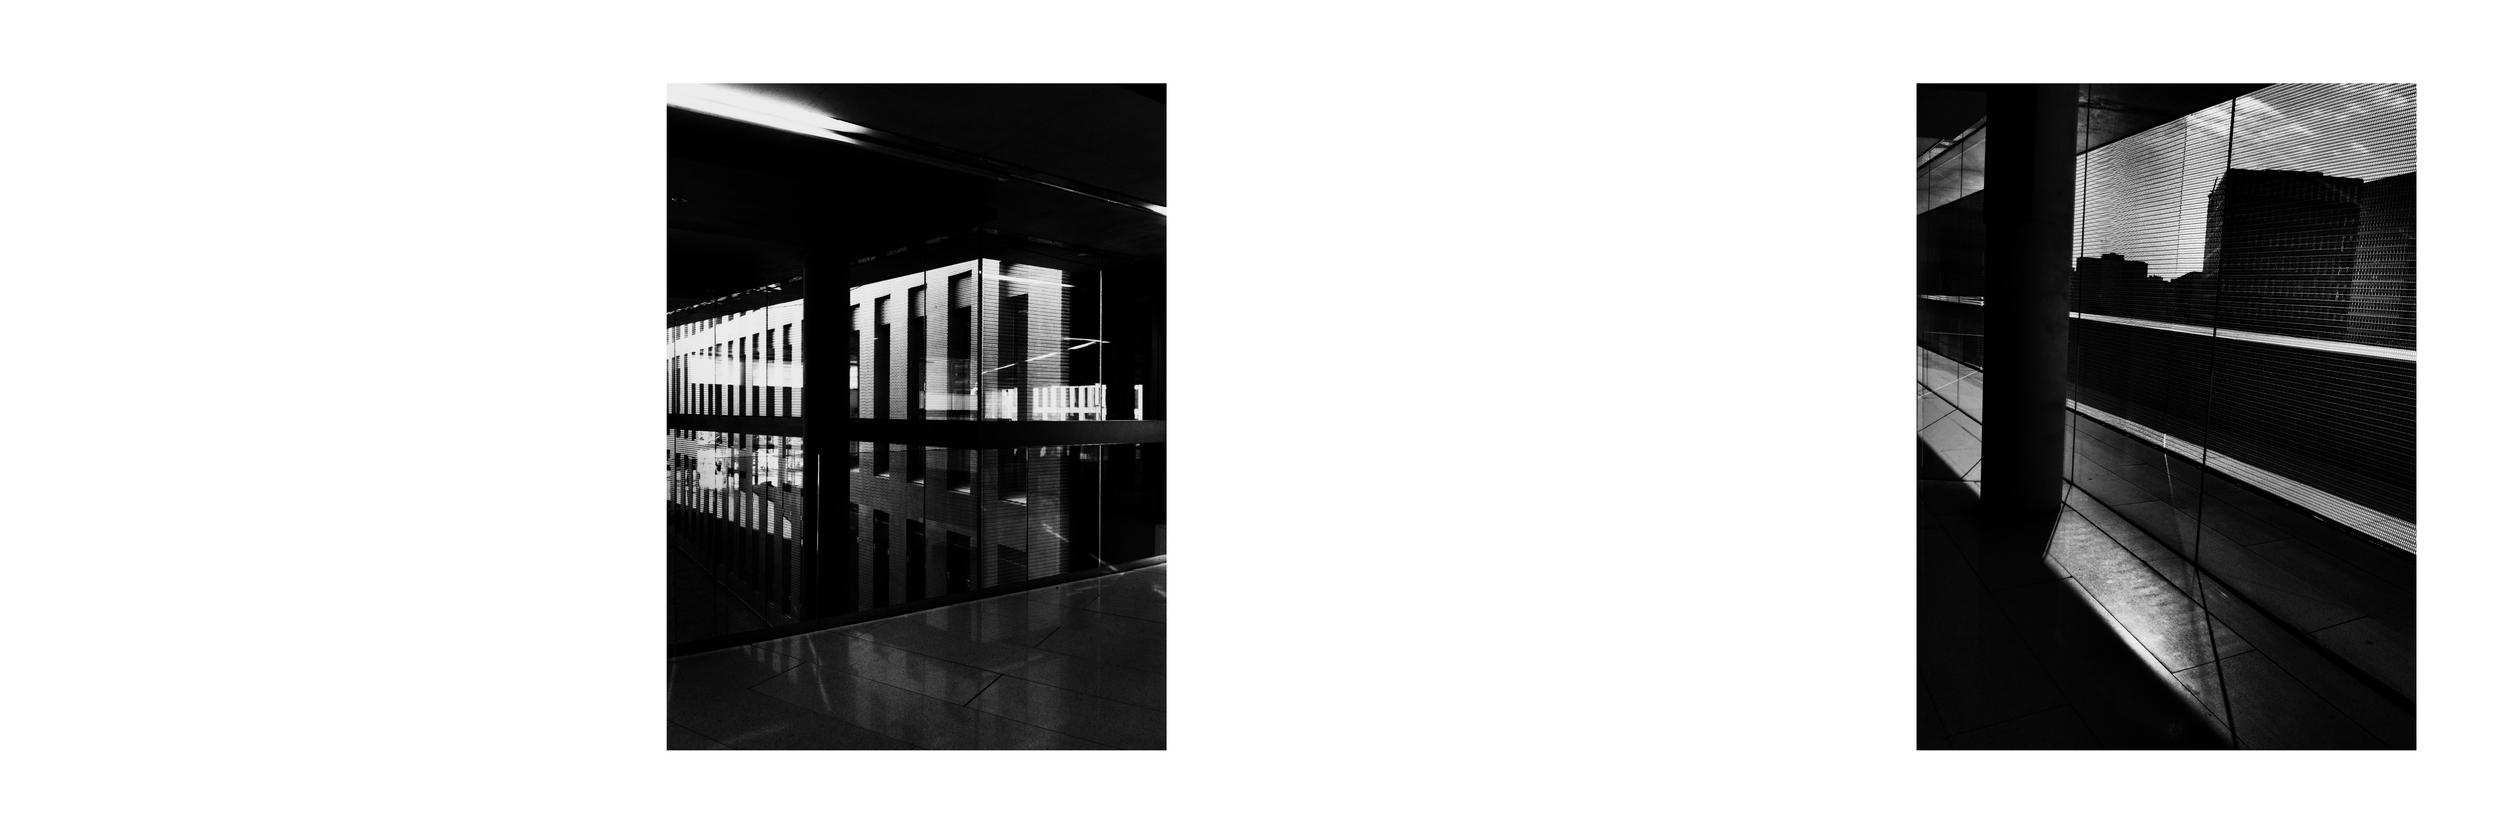 METRO-CITY_05223.jpg